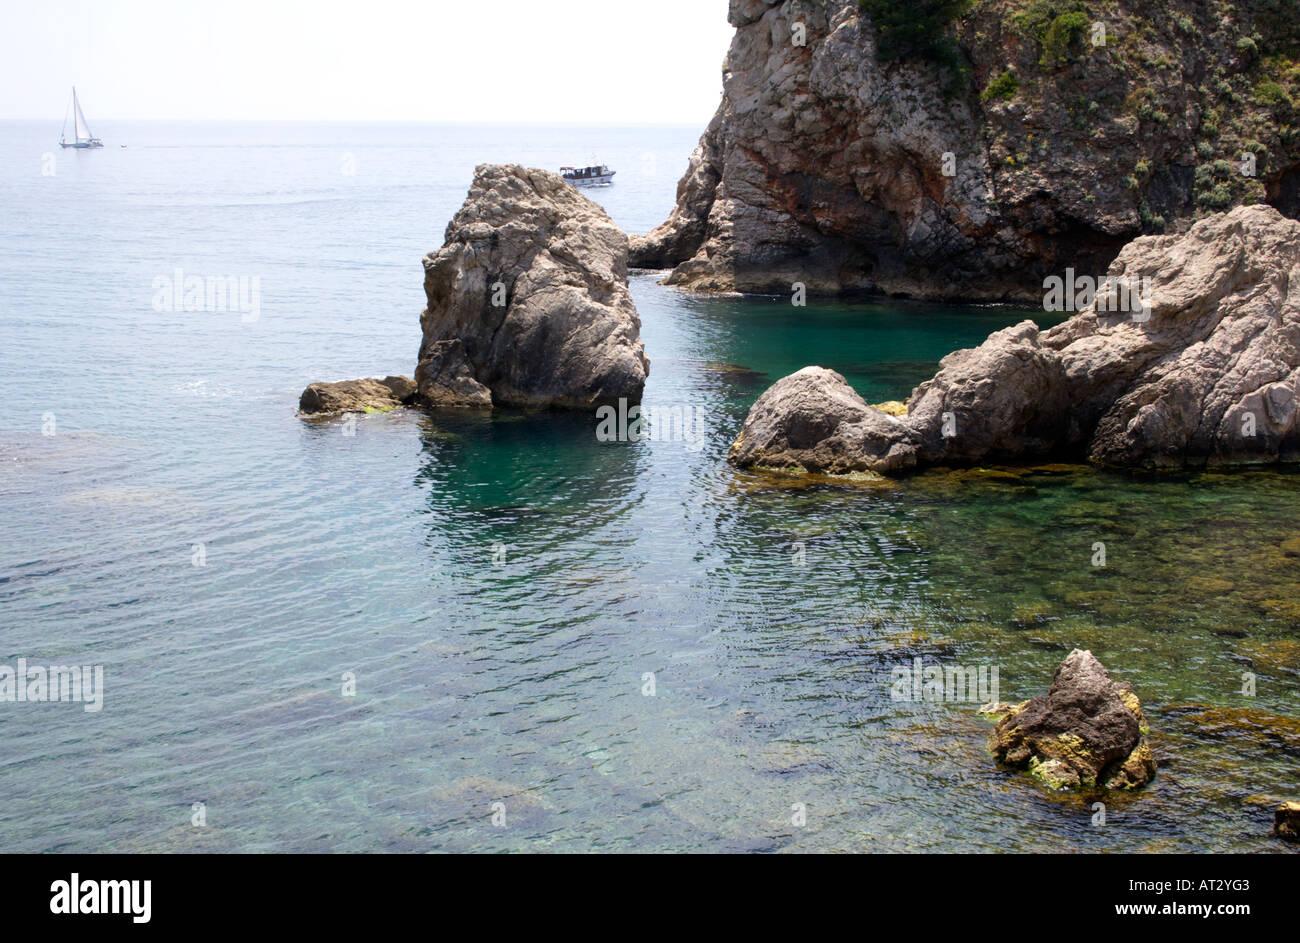 Boat in the Adriatic Sea - Stock Image